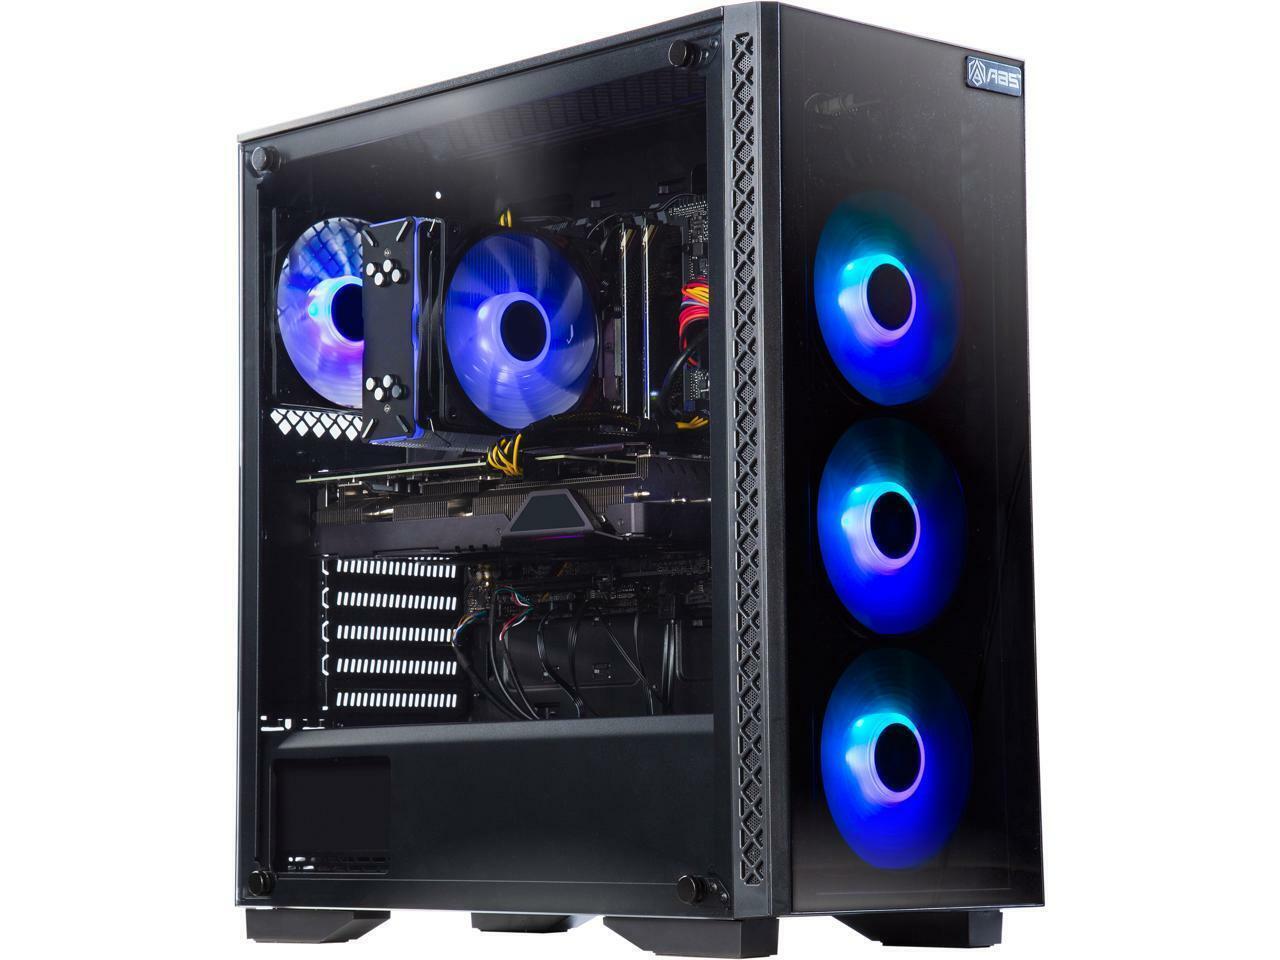 ABS Master Gaming PC - Intel i7 10700F - GeForce RTX 3060 - 16GB DDR4 3000MHz -